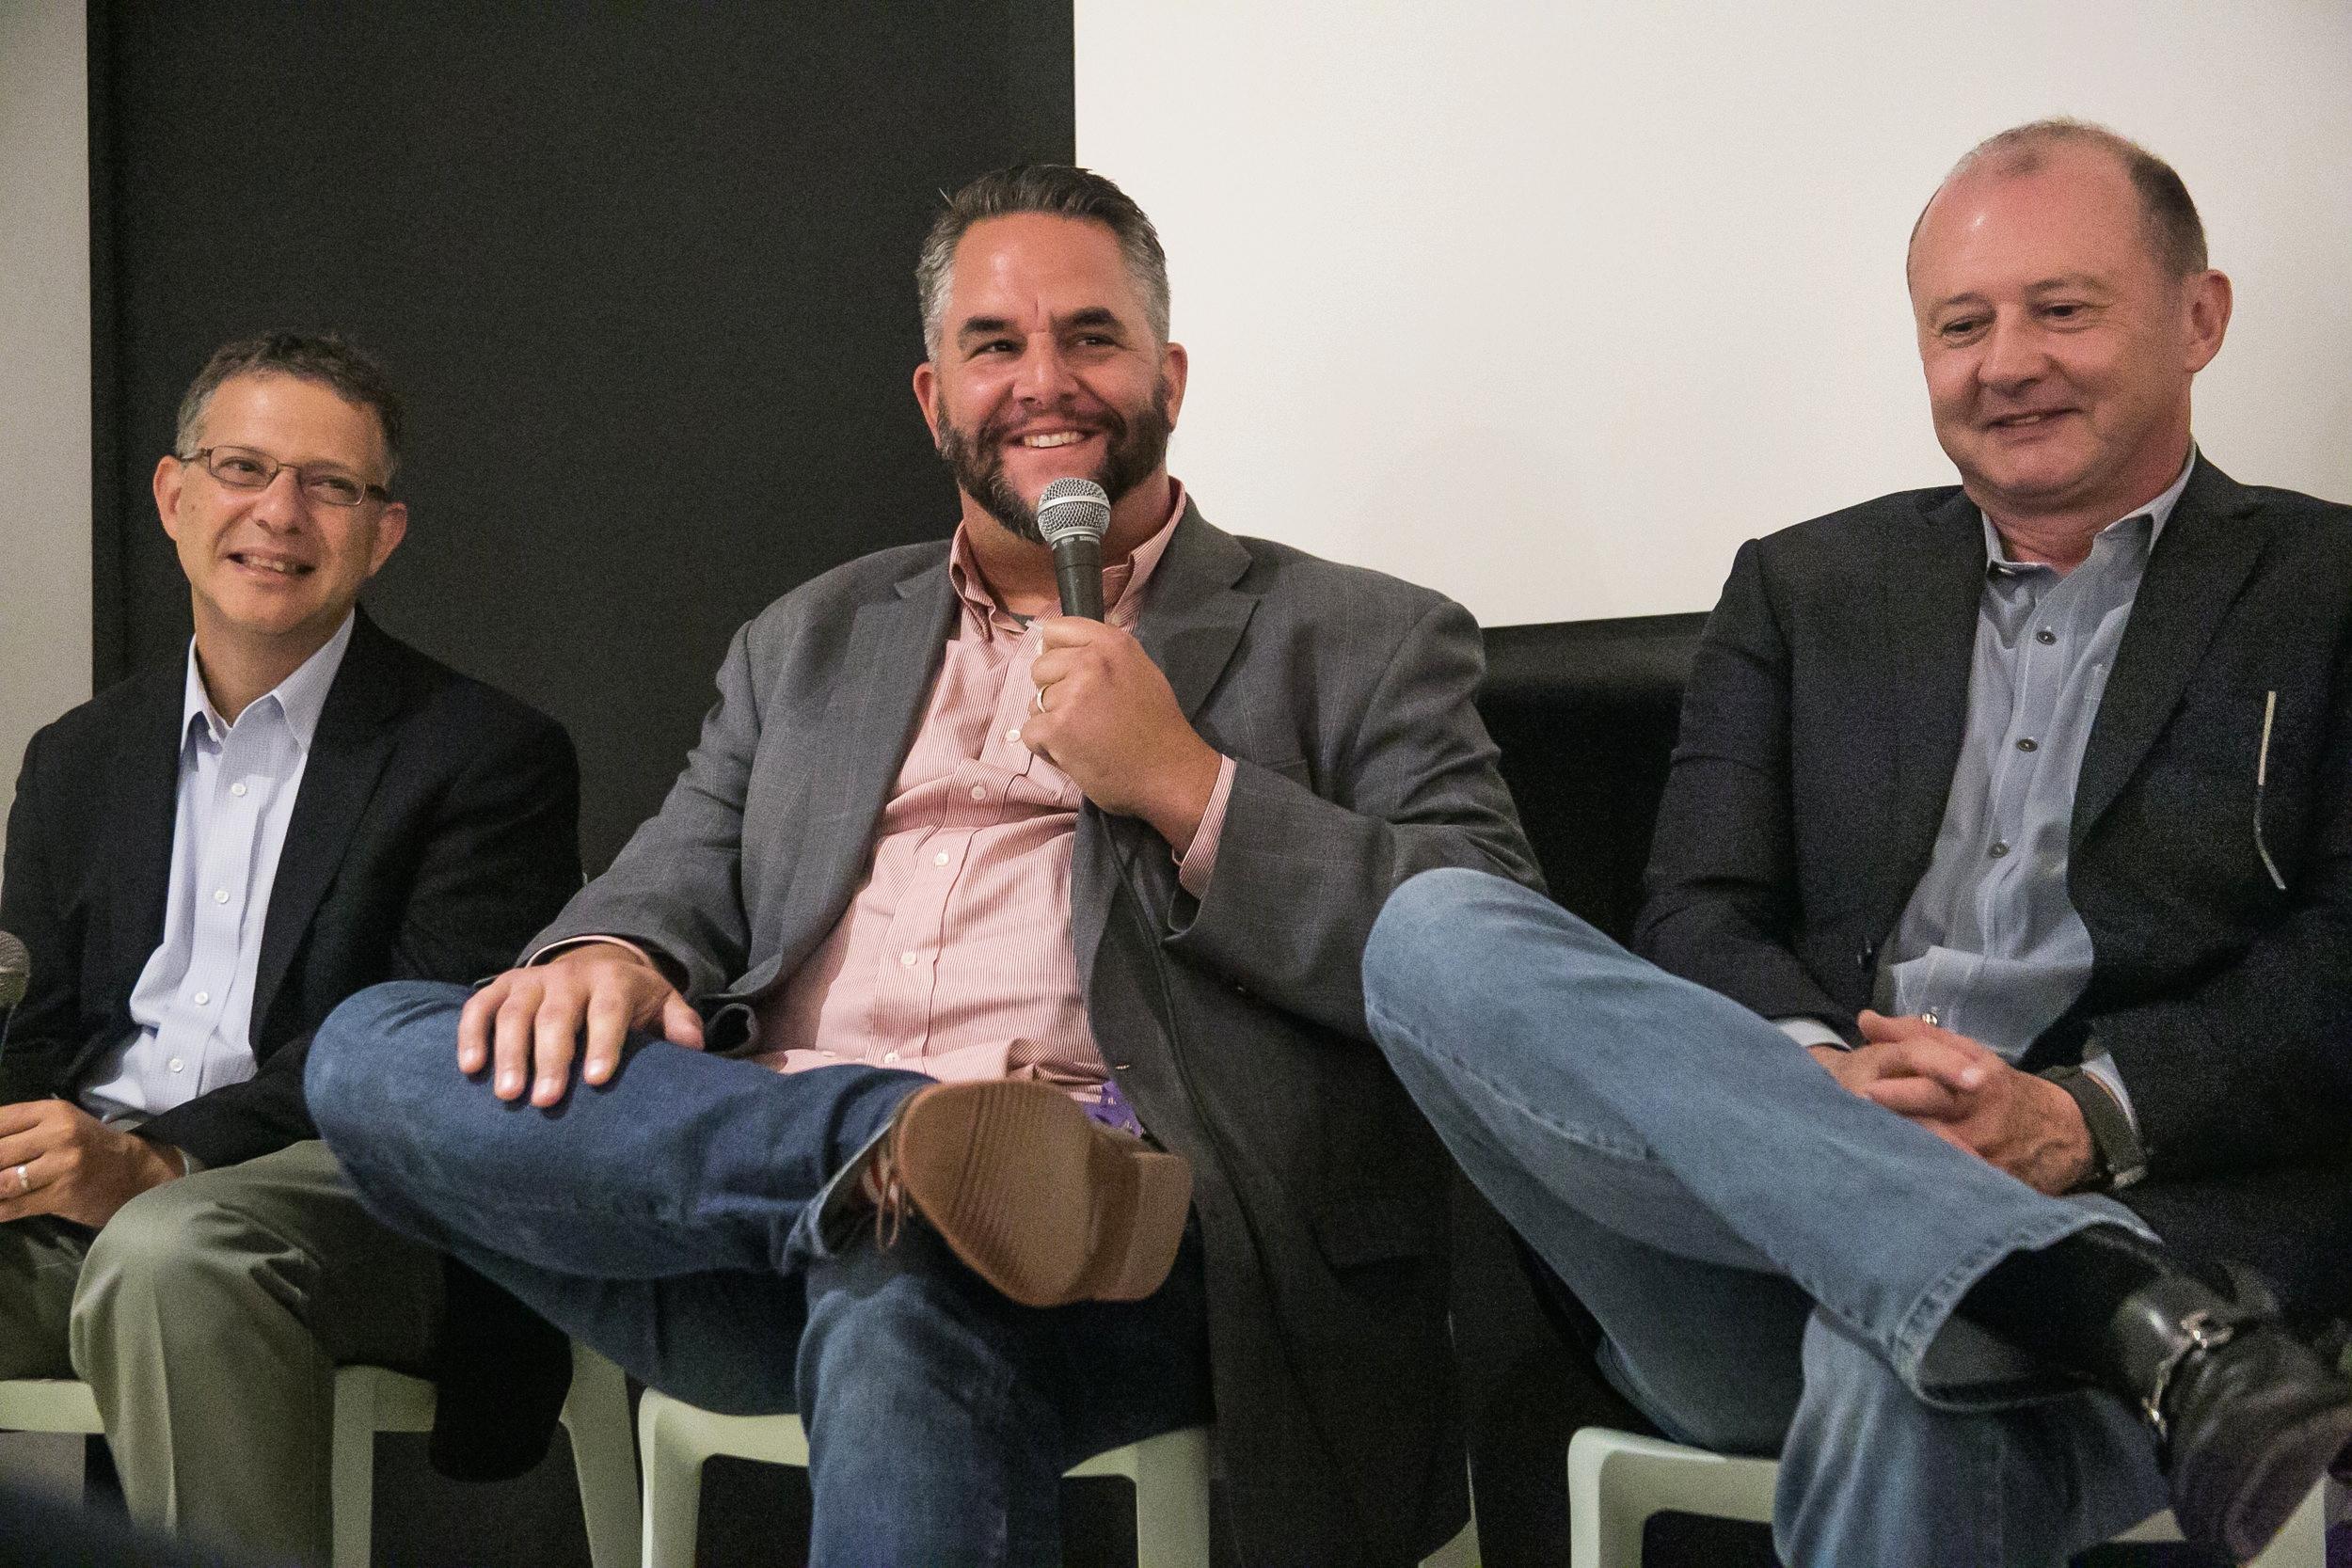 Tech 2025 - Driving Digital Conference - Ininito Gallery, Manhattan, NY